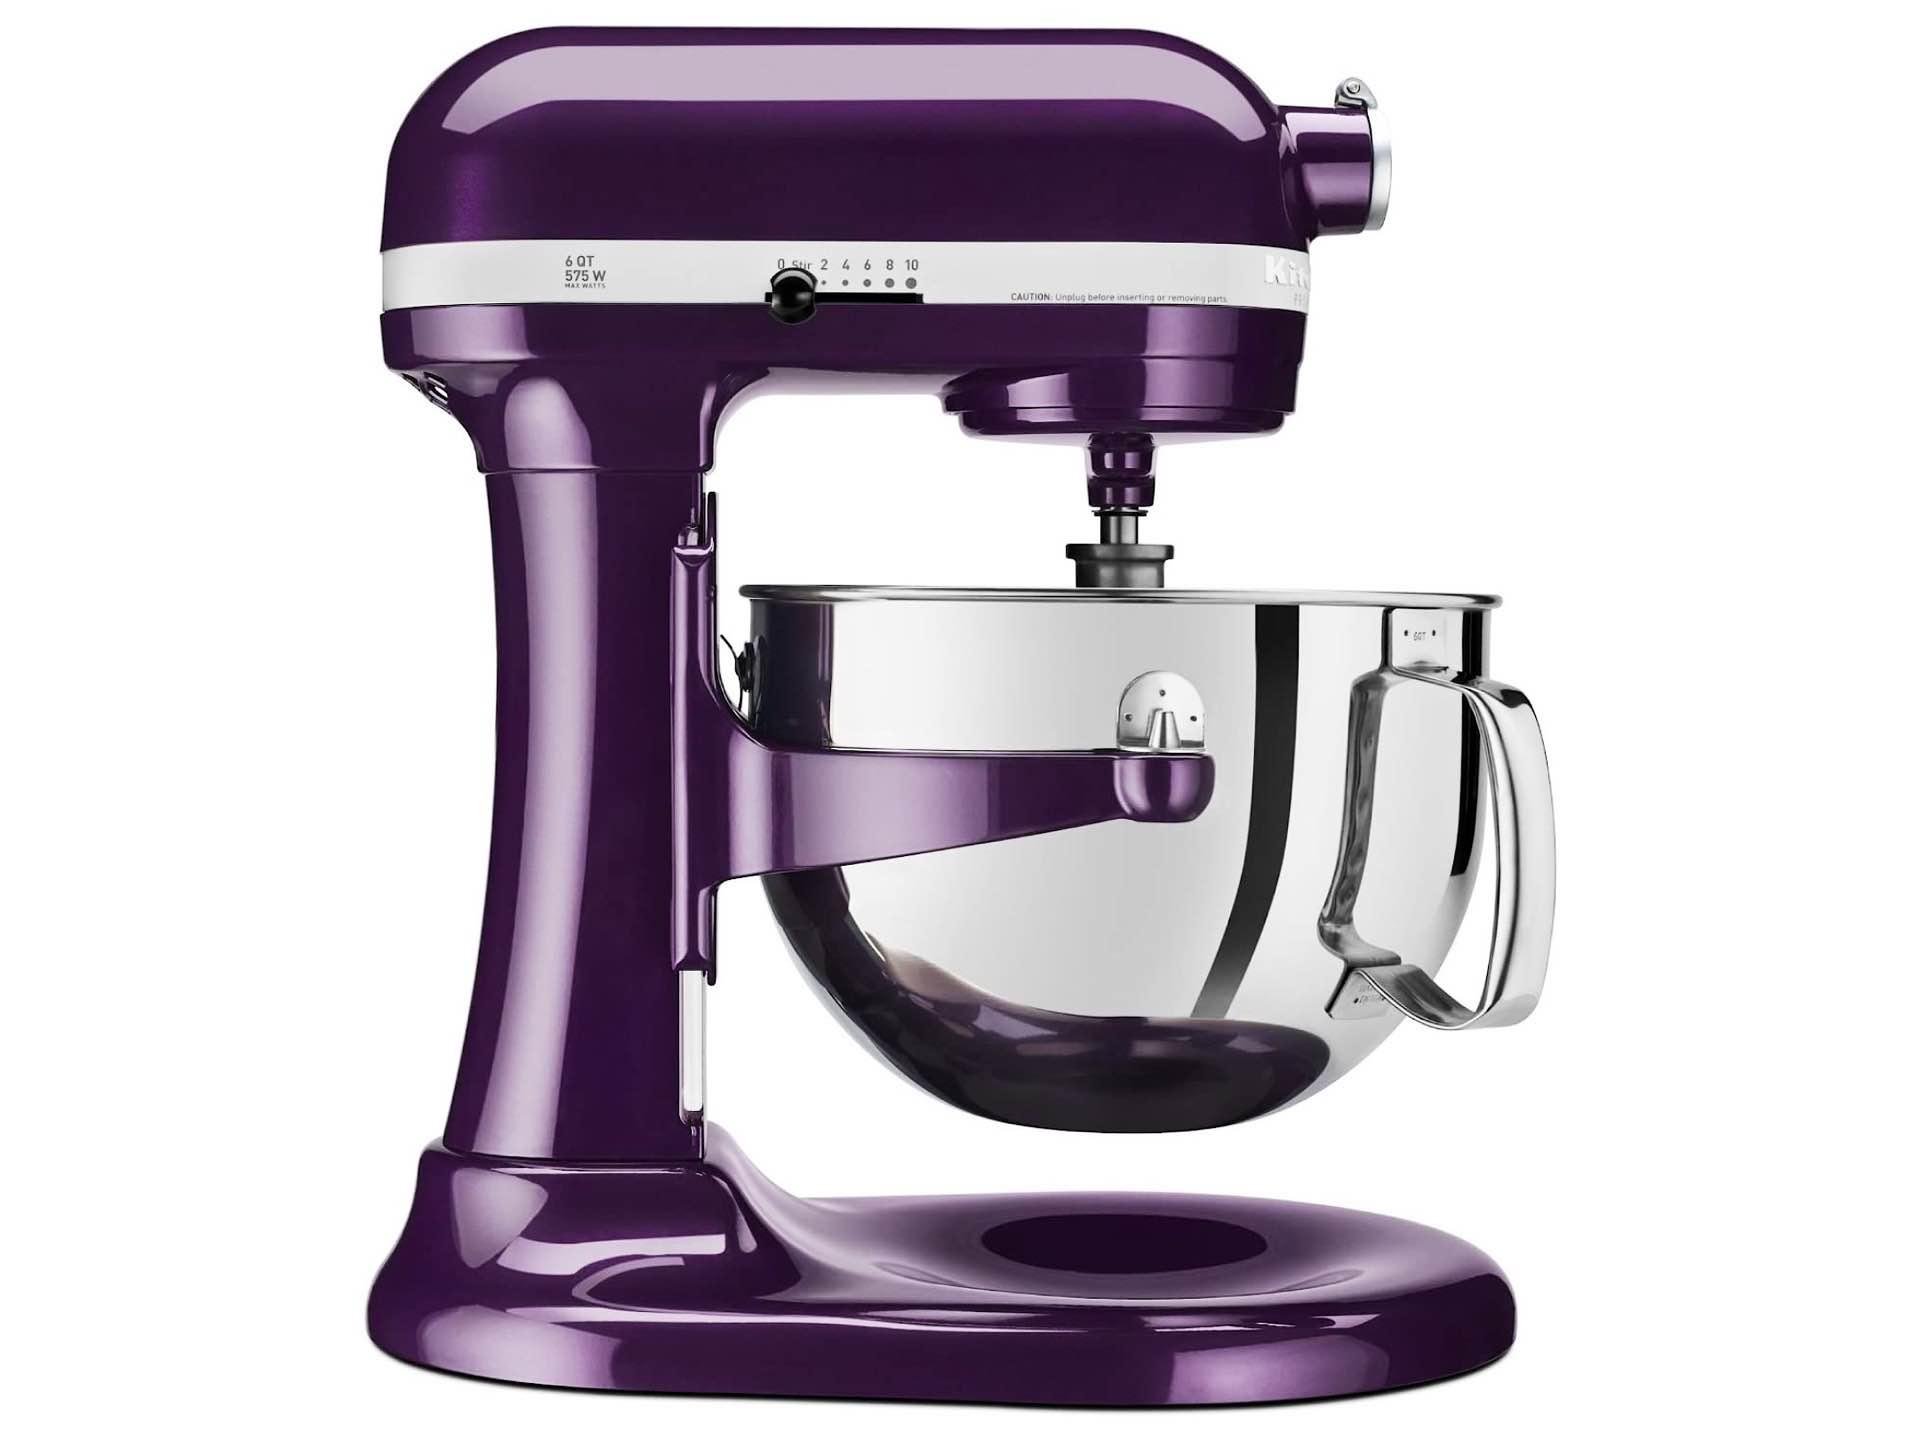 kitchenaid-pro-600-series-stand-mixer-plum-berry-purple